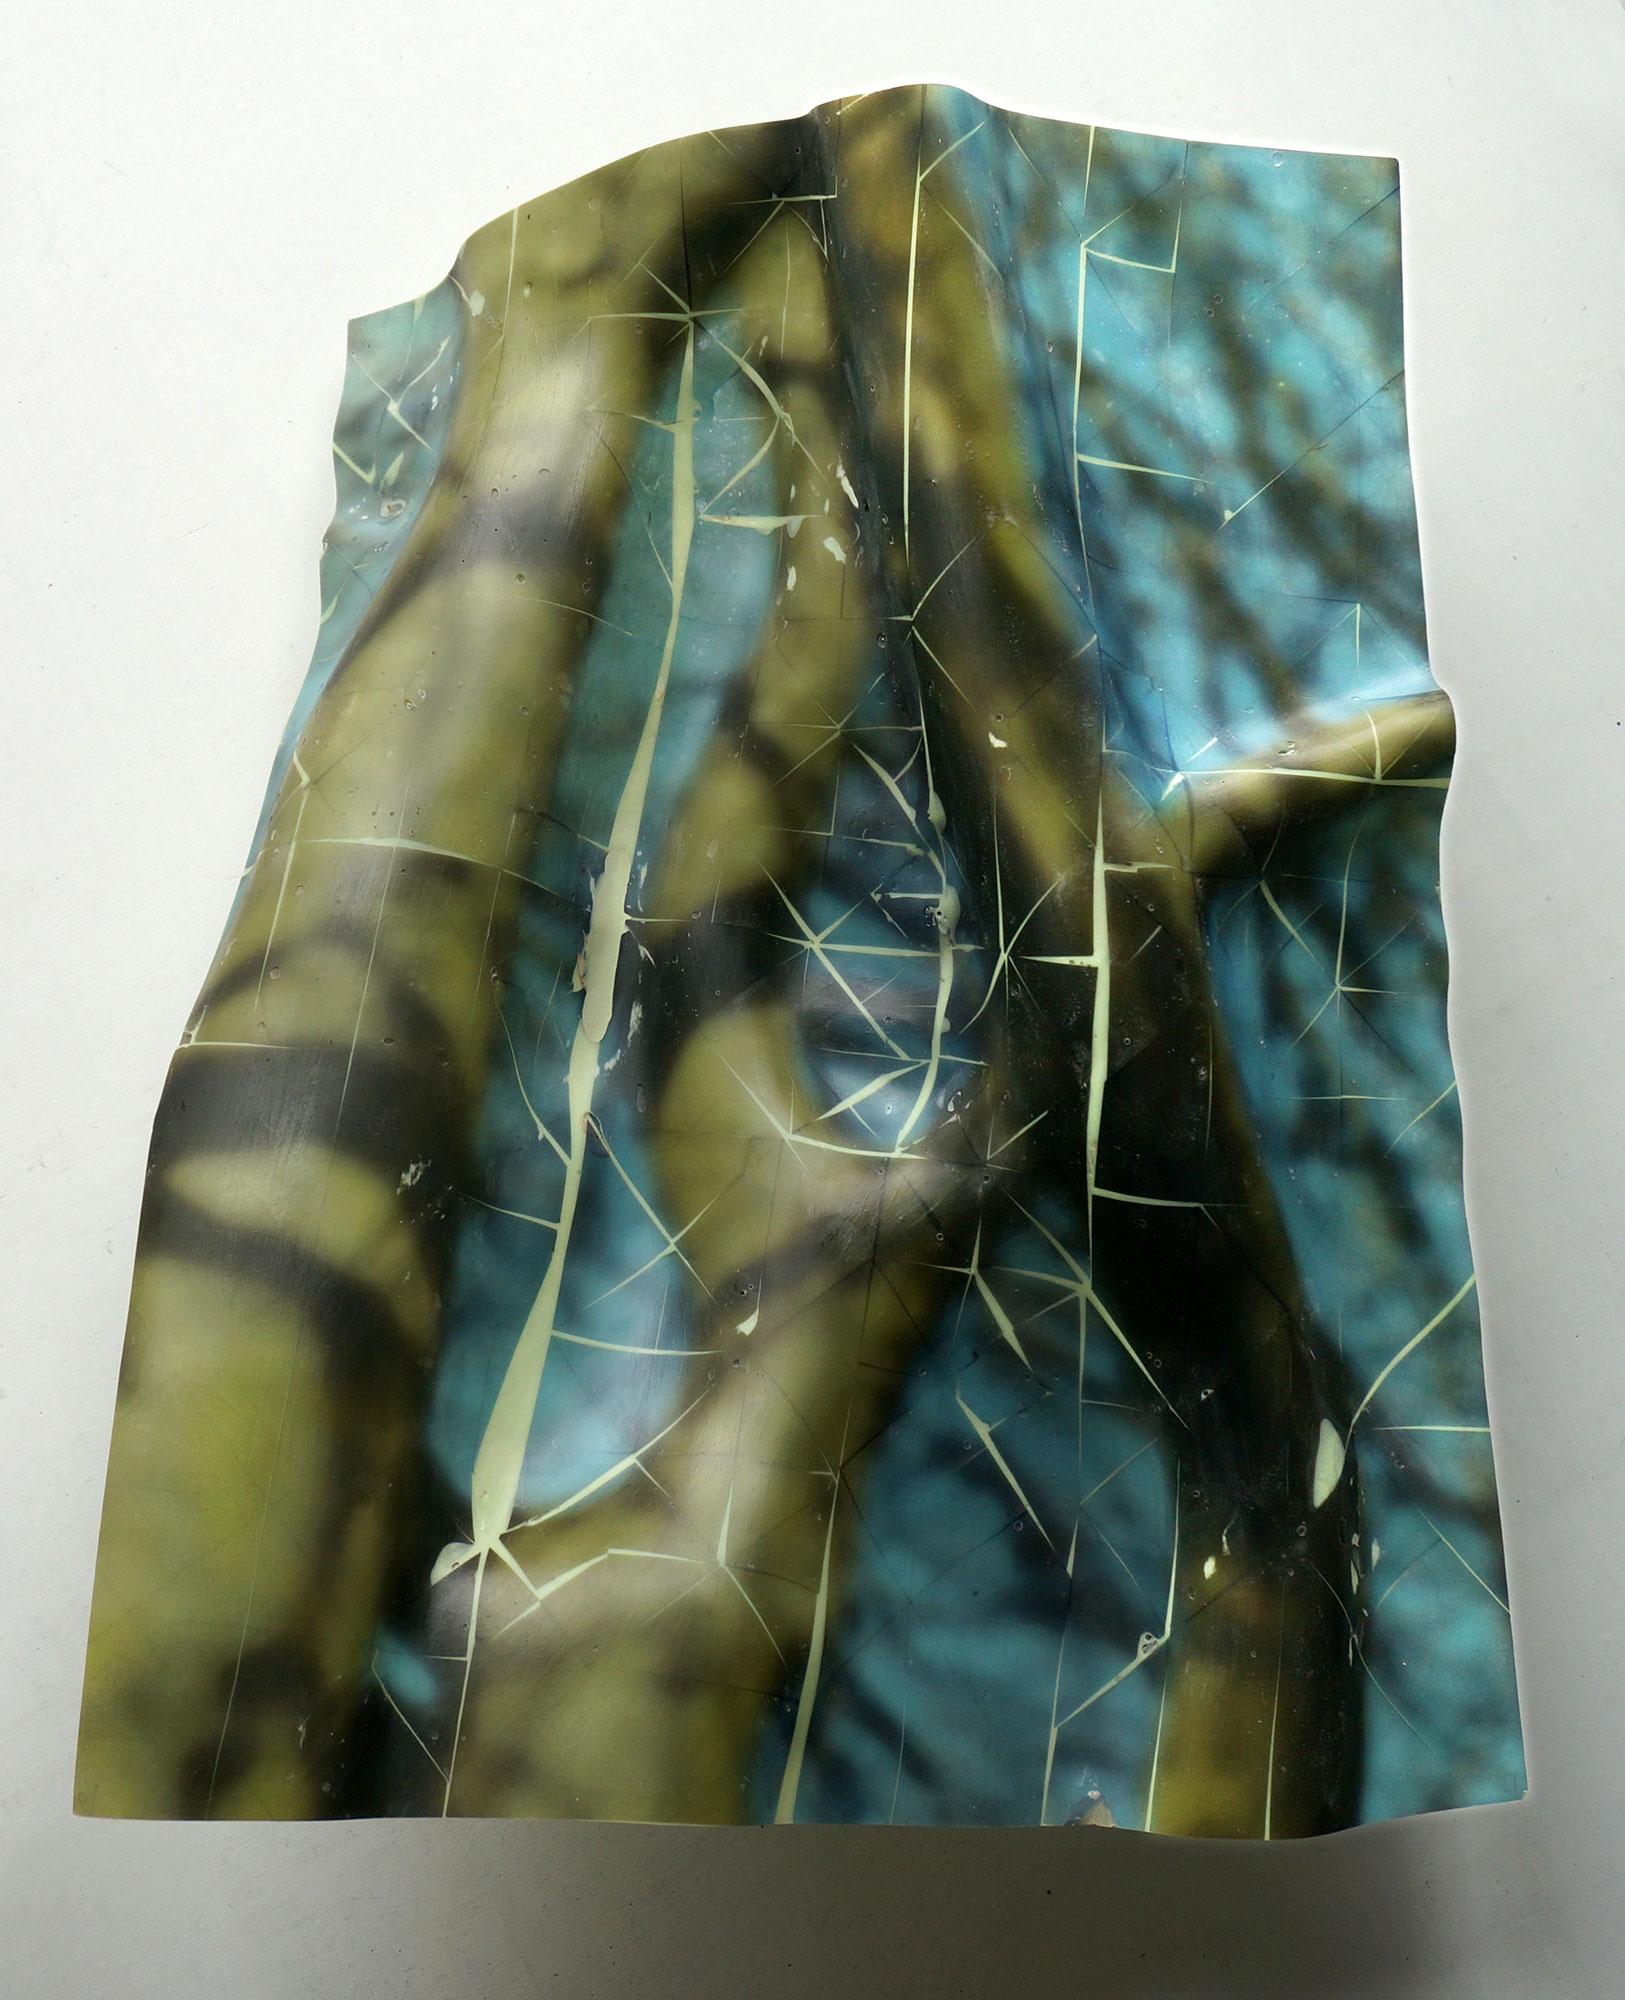 Tree Trunks 1 (Version 3), 2021, 58x48x20cms